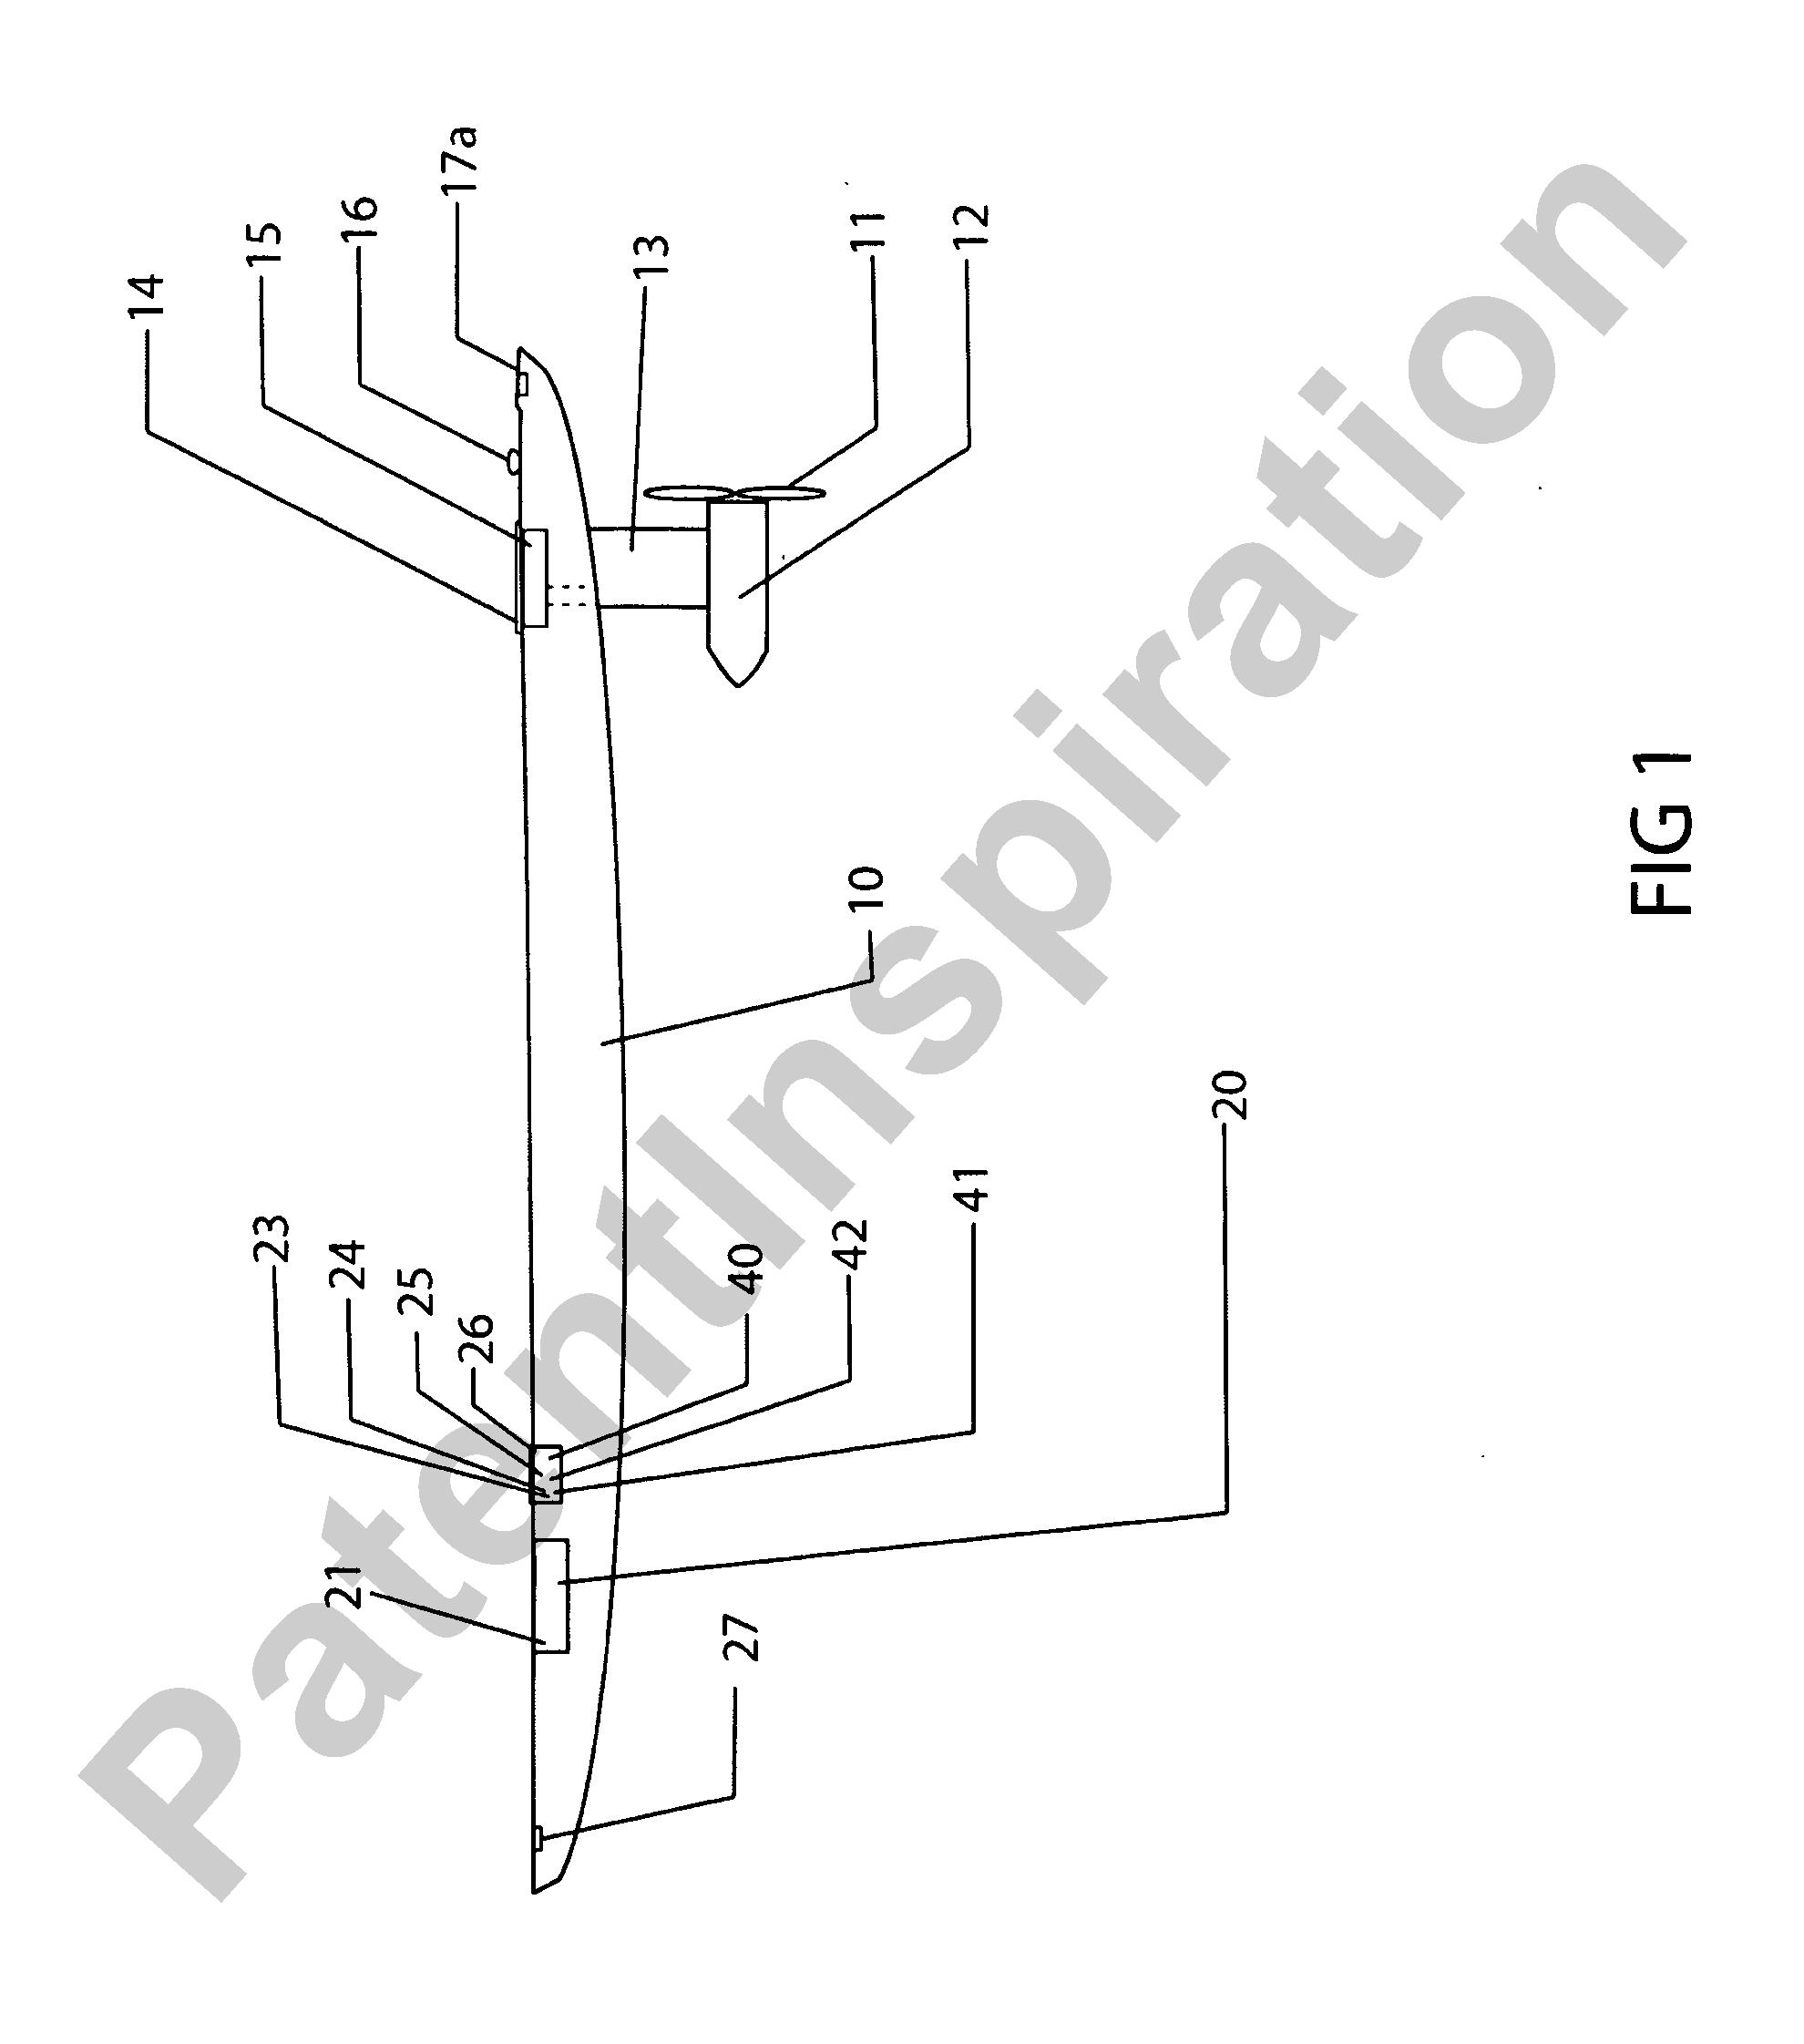 5kg Wire Diagram Wiring Diagrams Rca Power Online